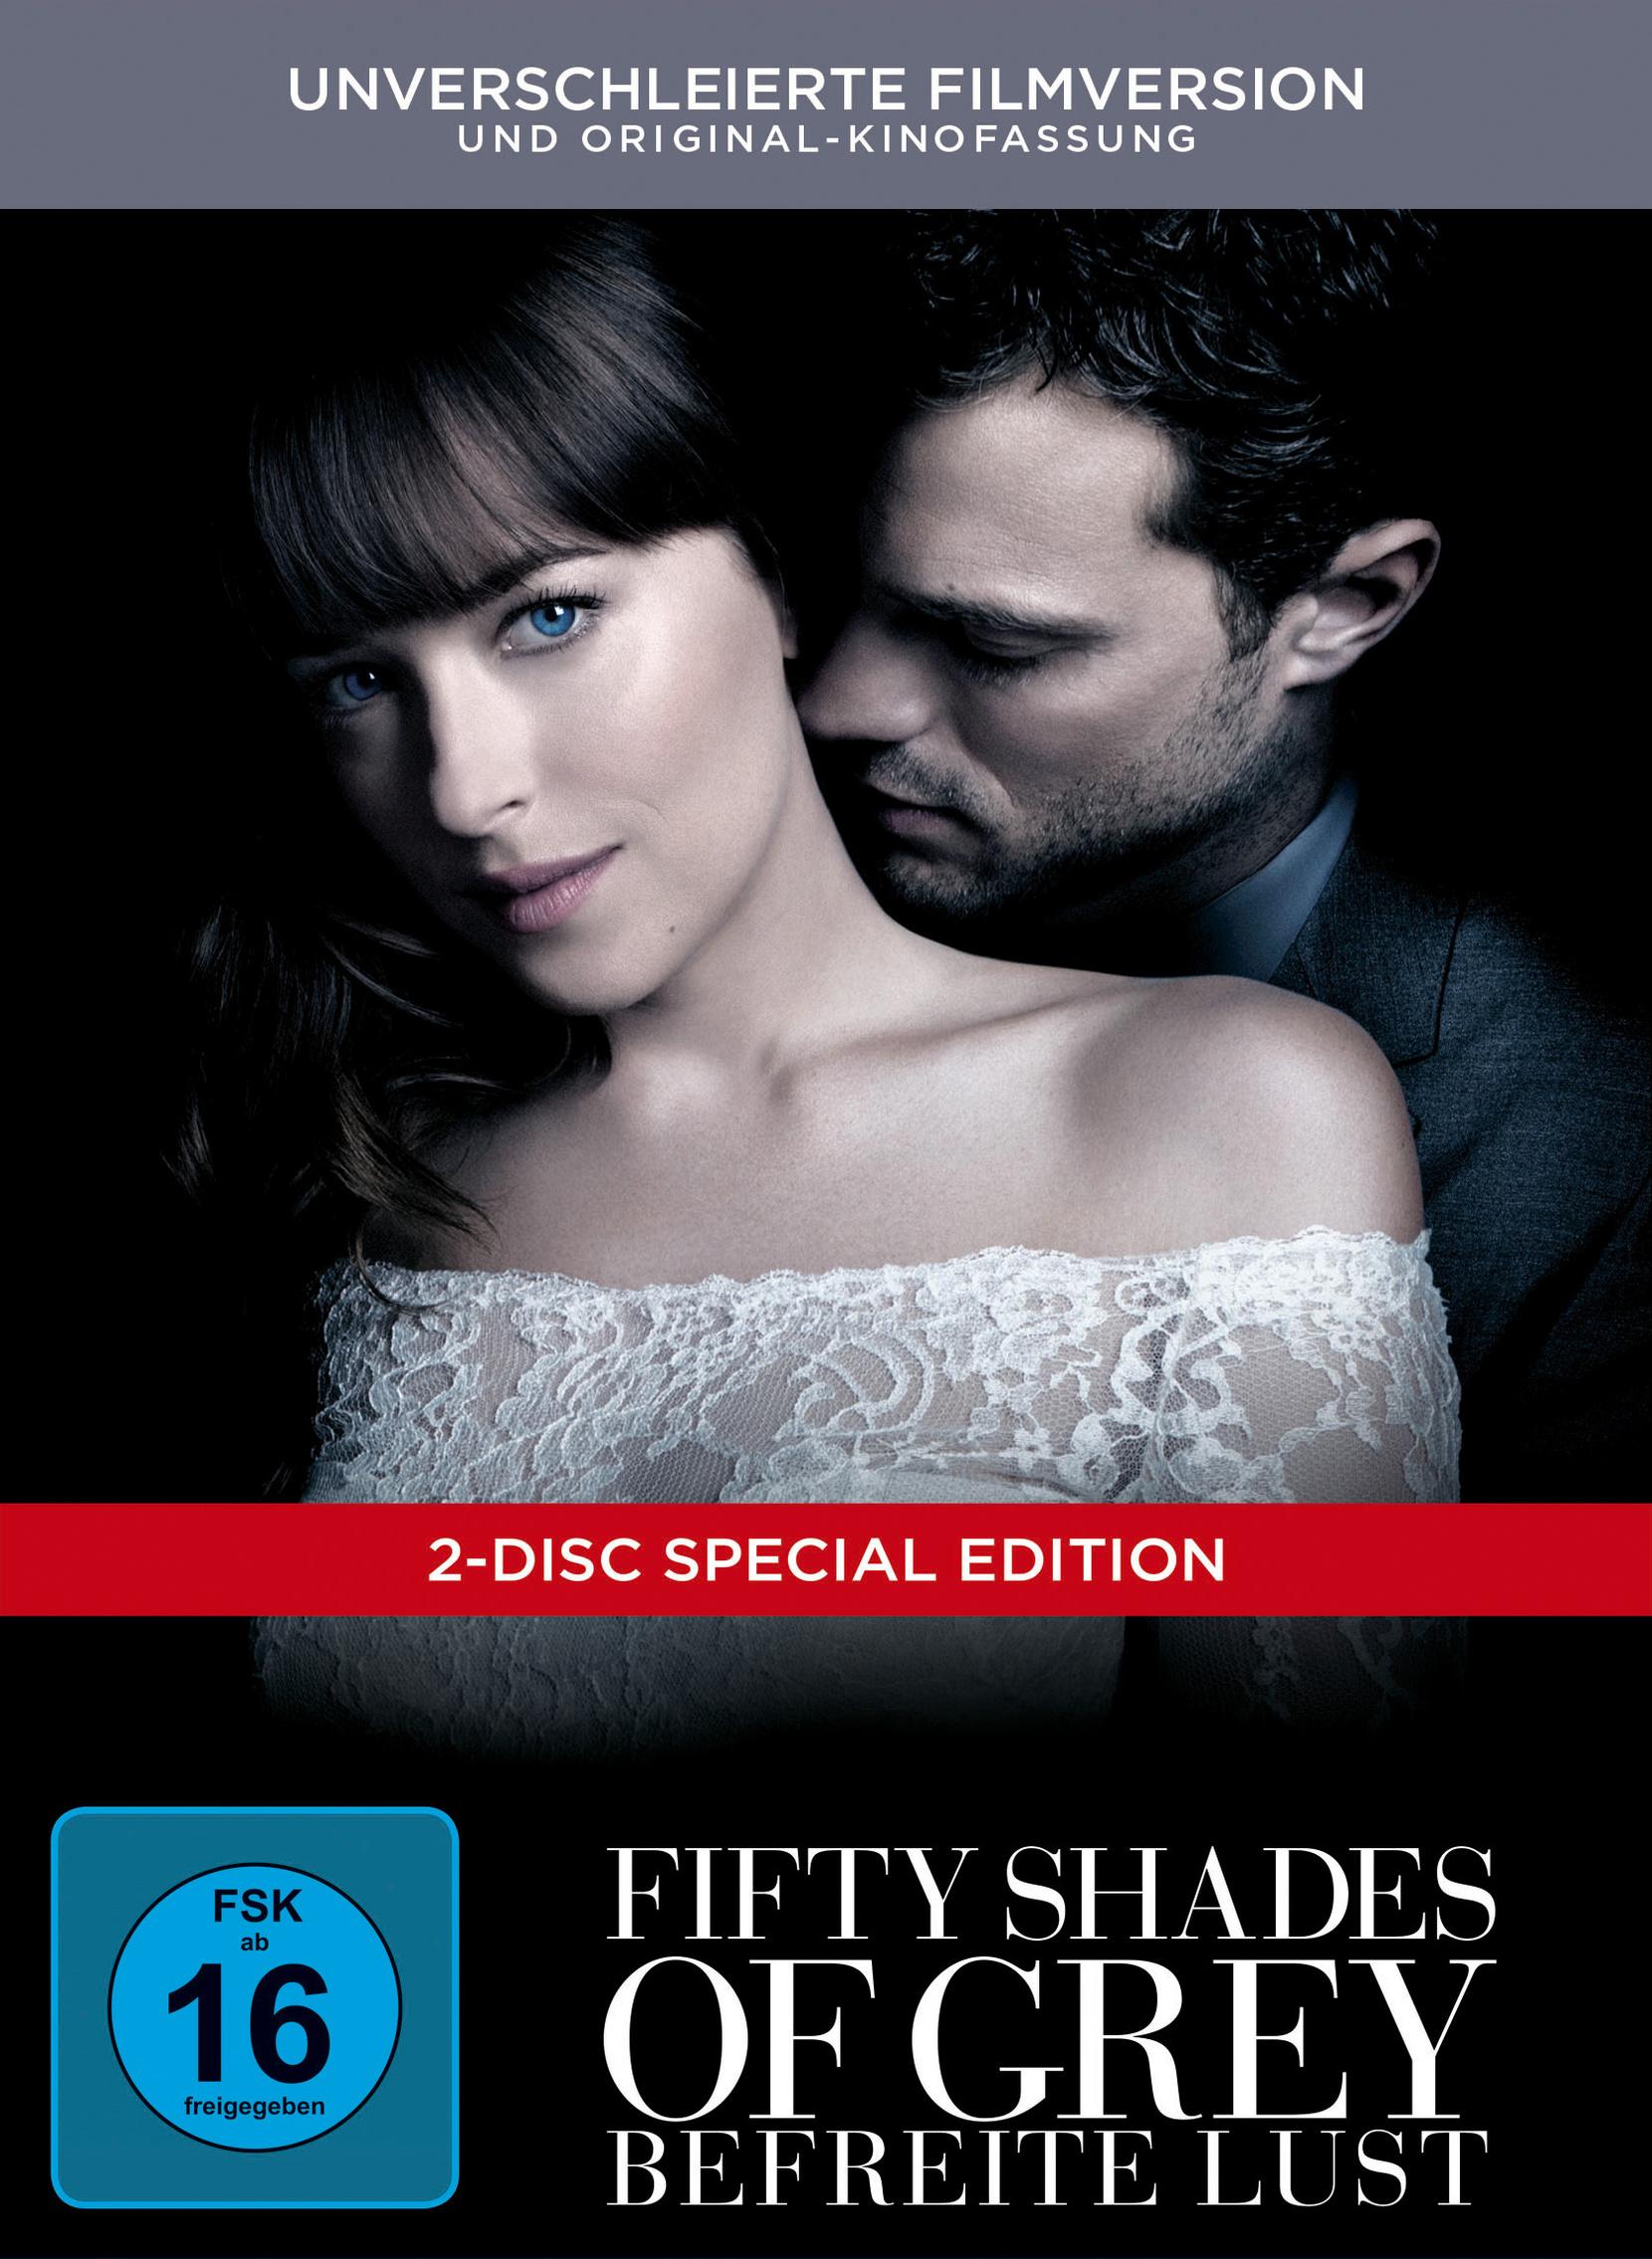 Fifty Shades of Grey 3: Befreite Lust - Digibook Film